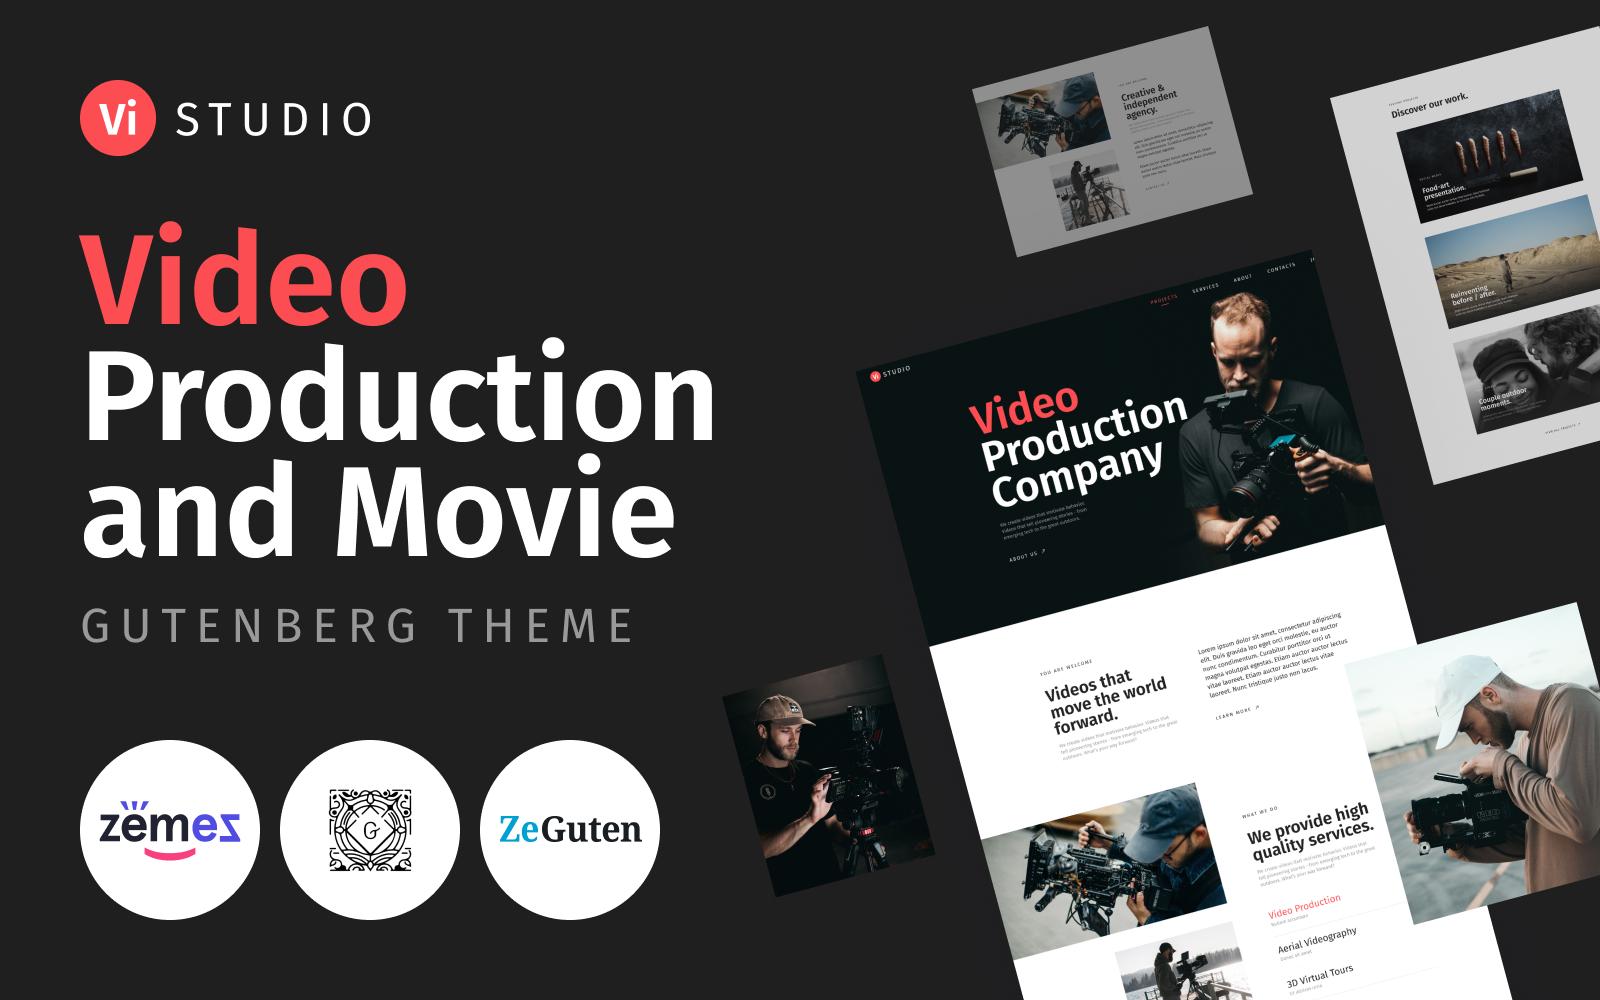 Reszponzív Vistudio - Video Production and Movie WordPress sablon 116426